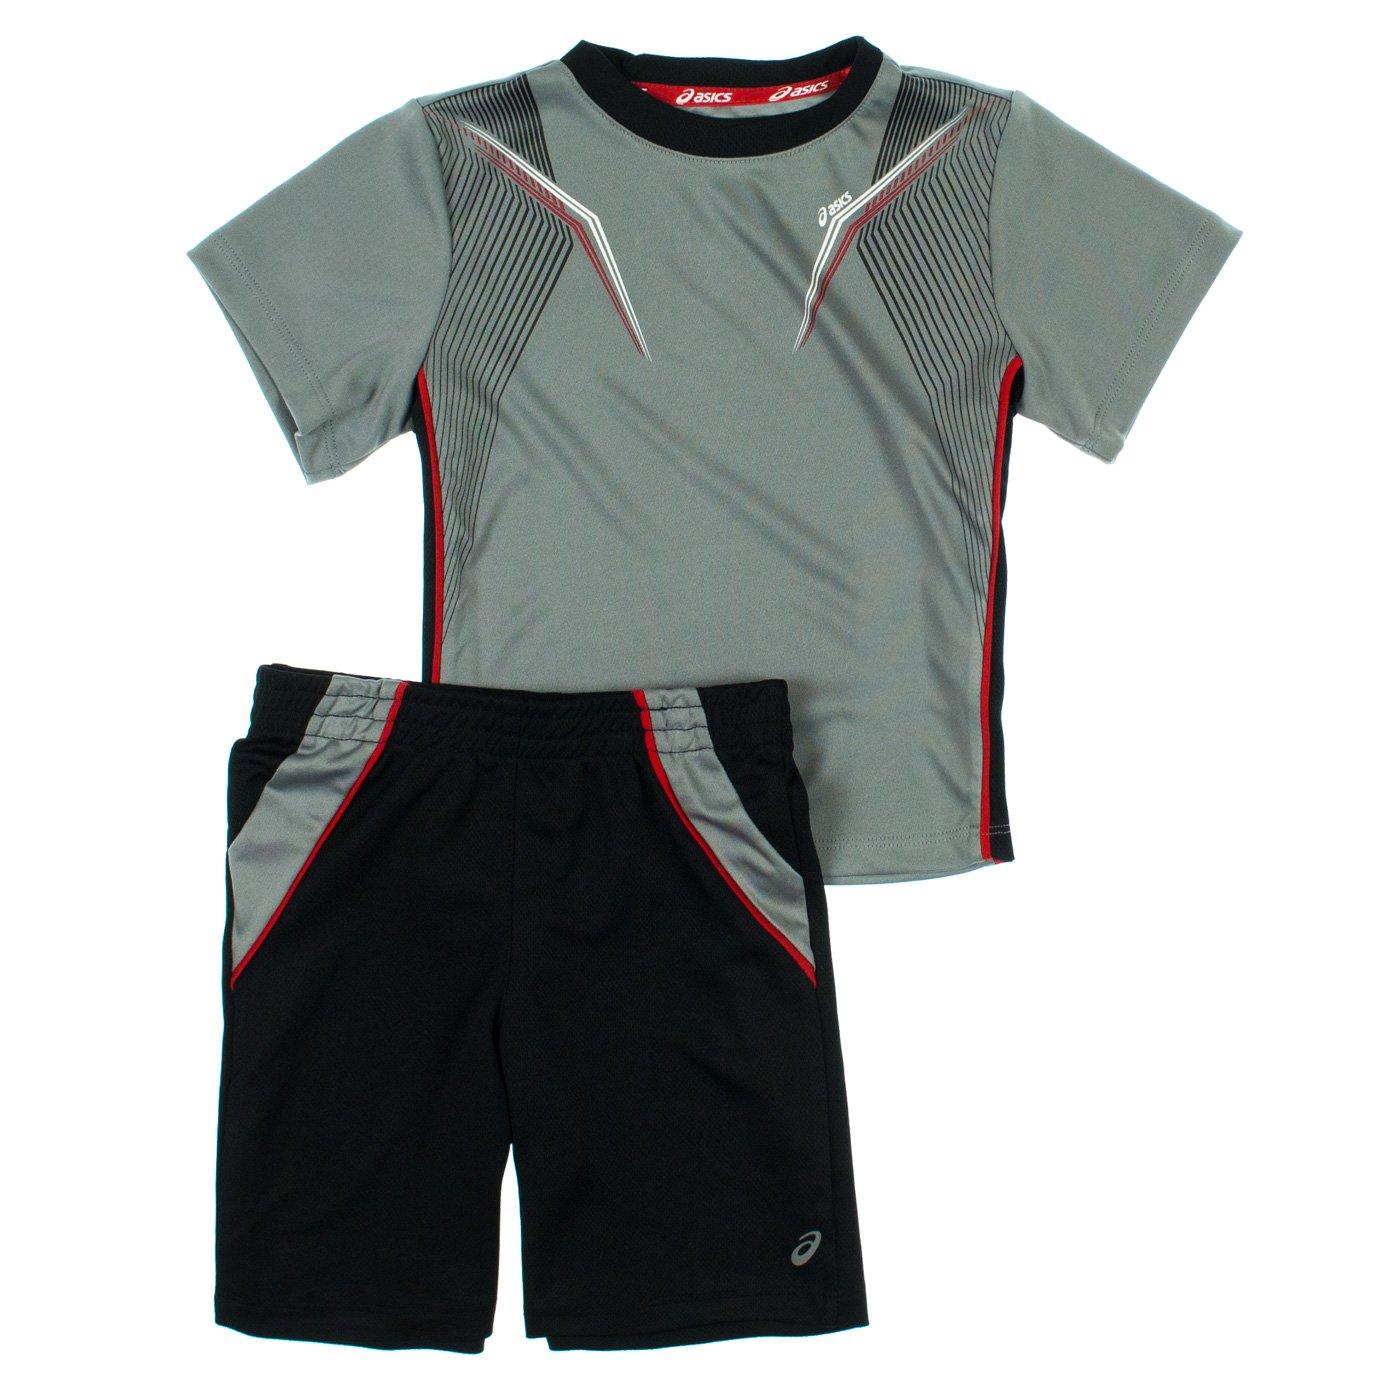 Asics Boys 2-7 2-Piece Athletic Top /& Shorts Set 2T Monument Gray